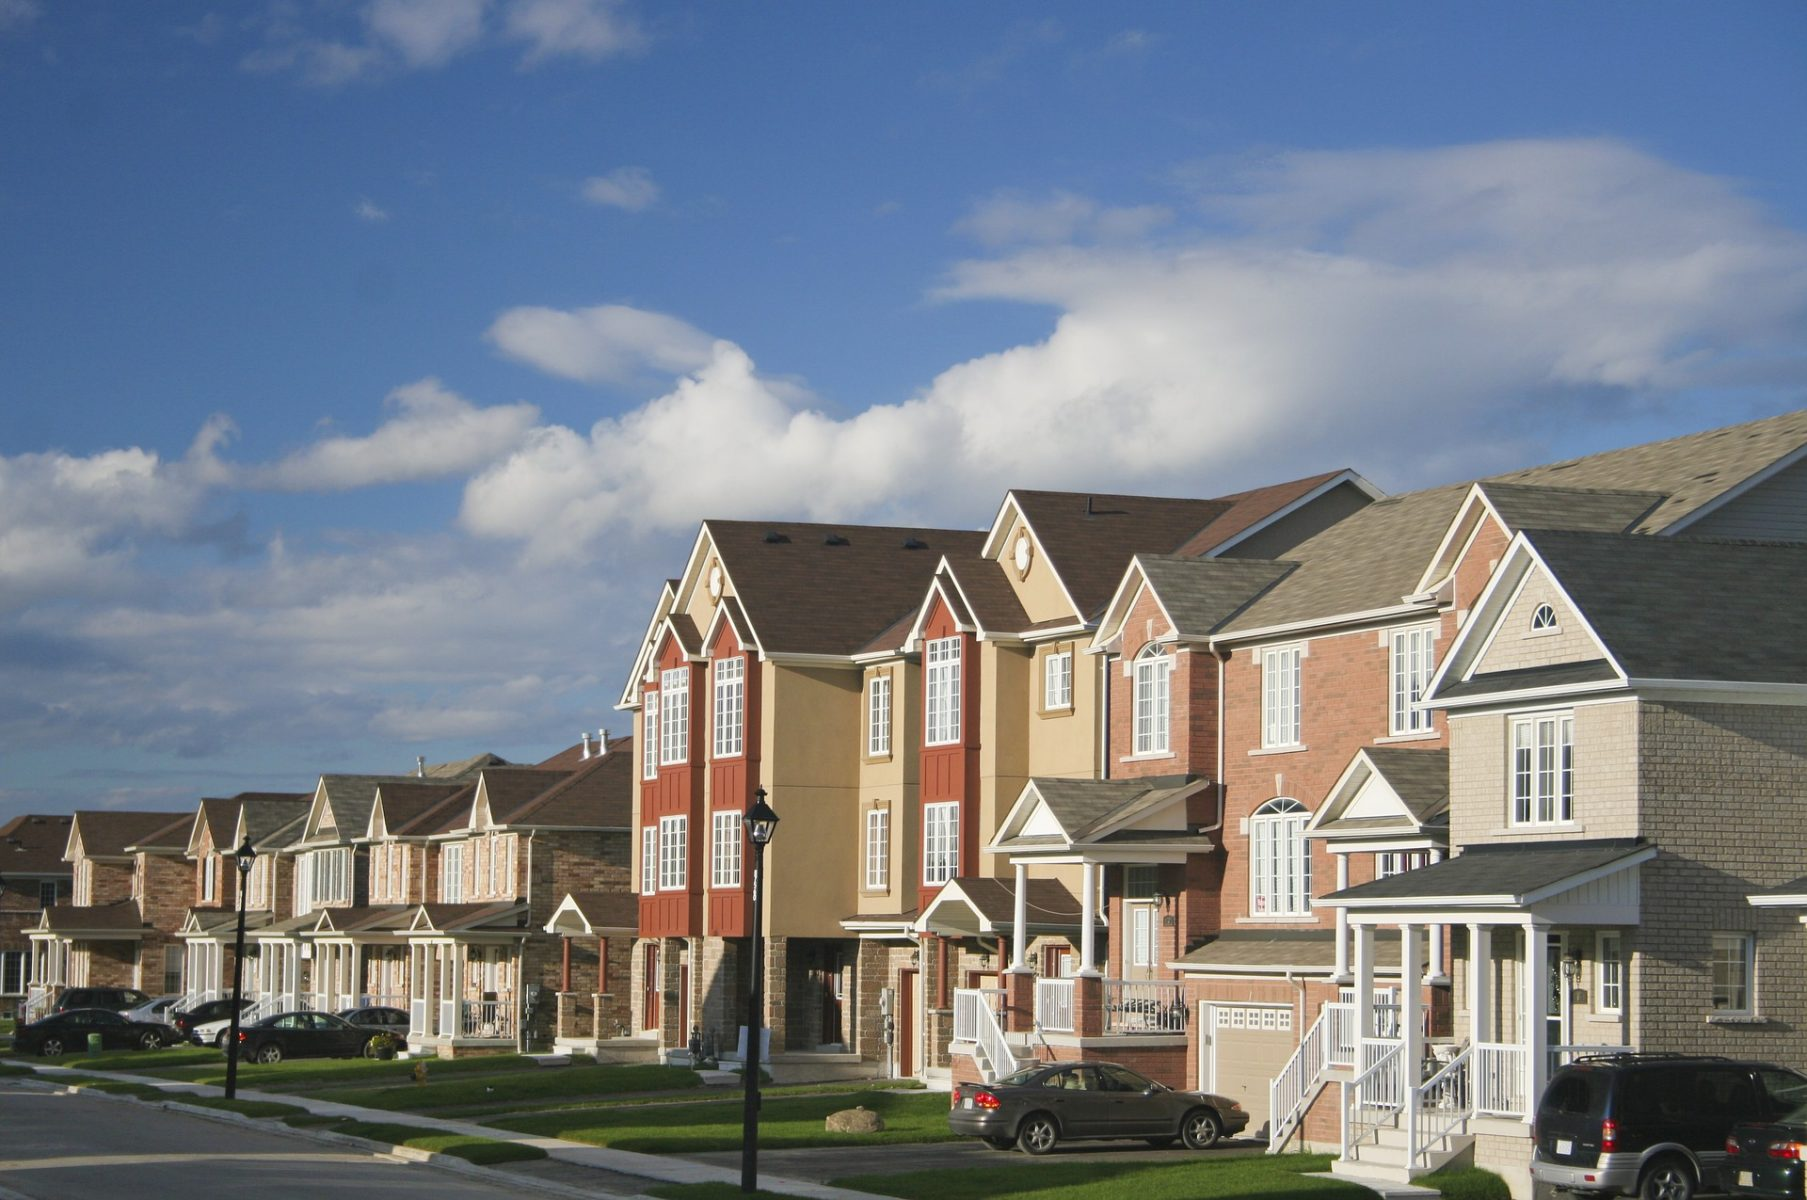 Will AARP help rein in HOA abuse? • Independent American Communities